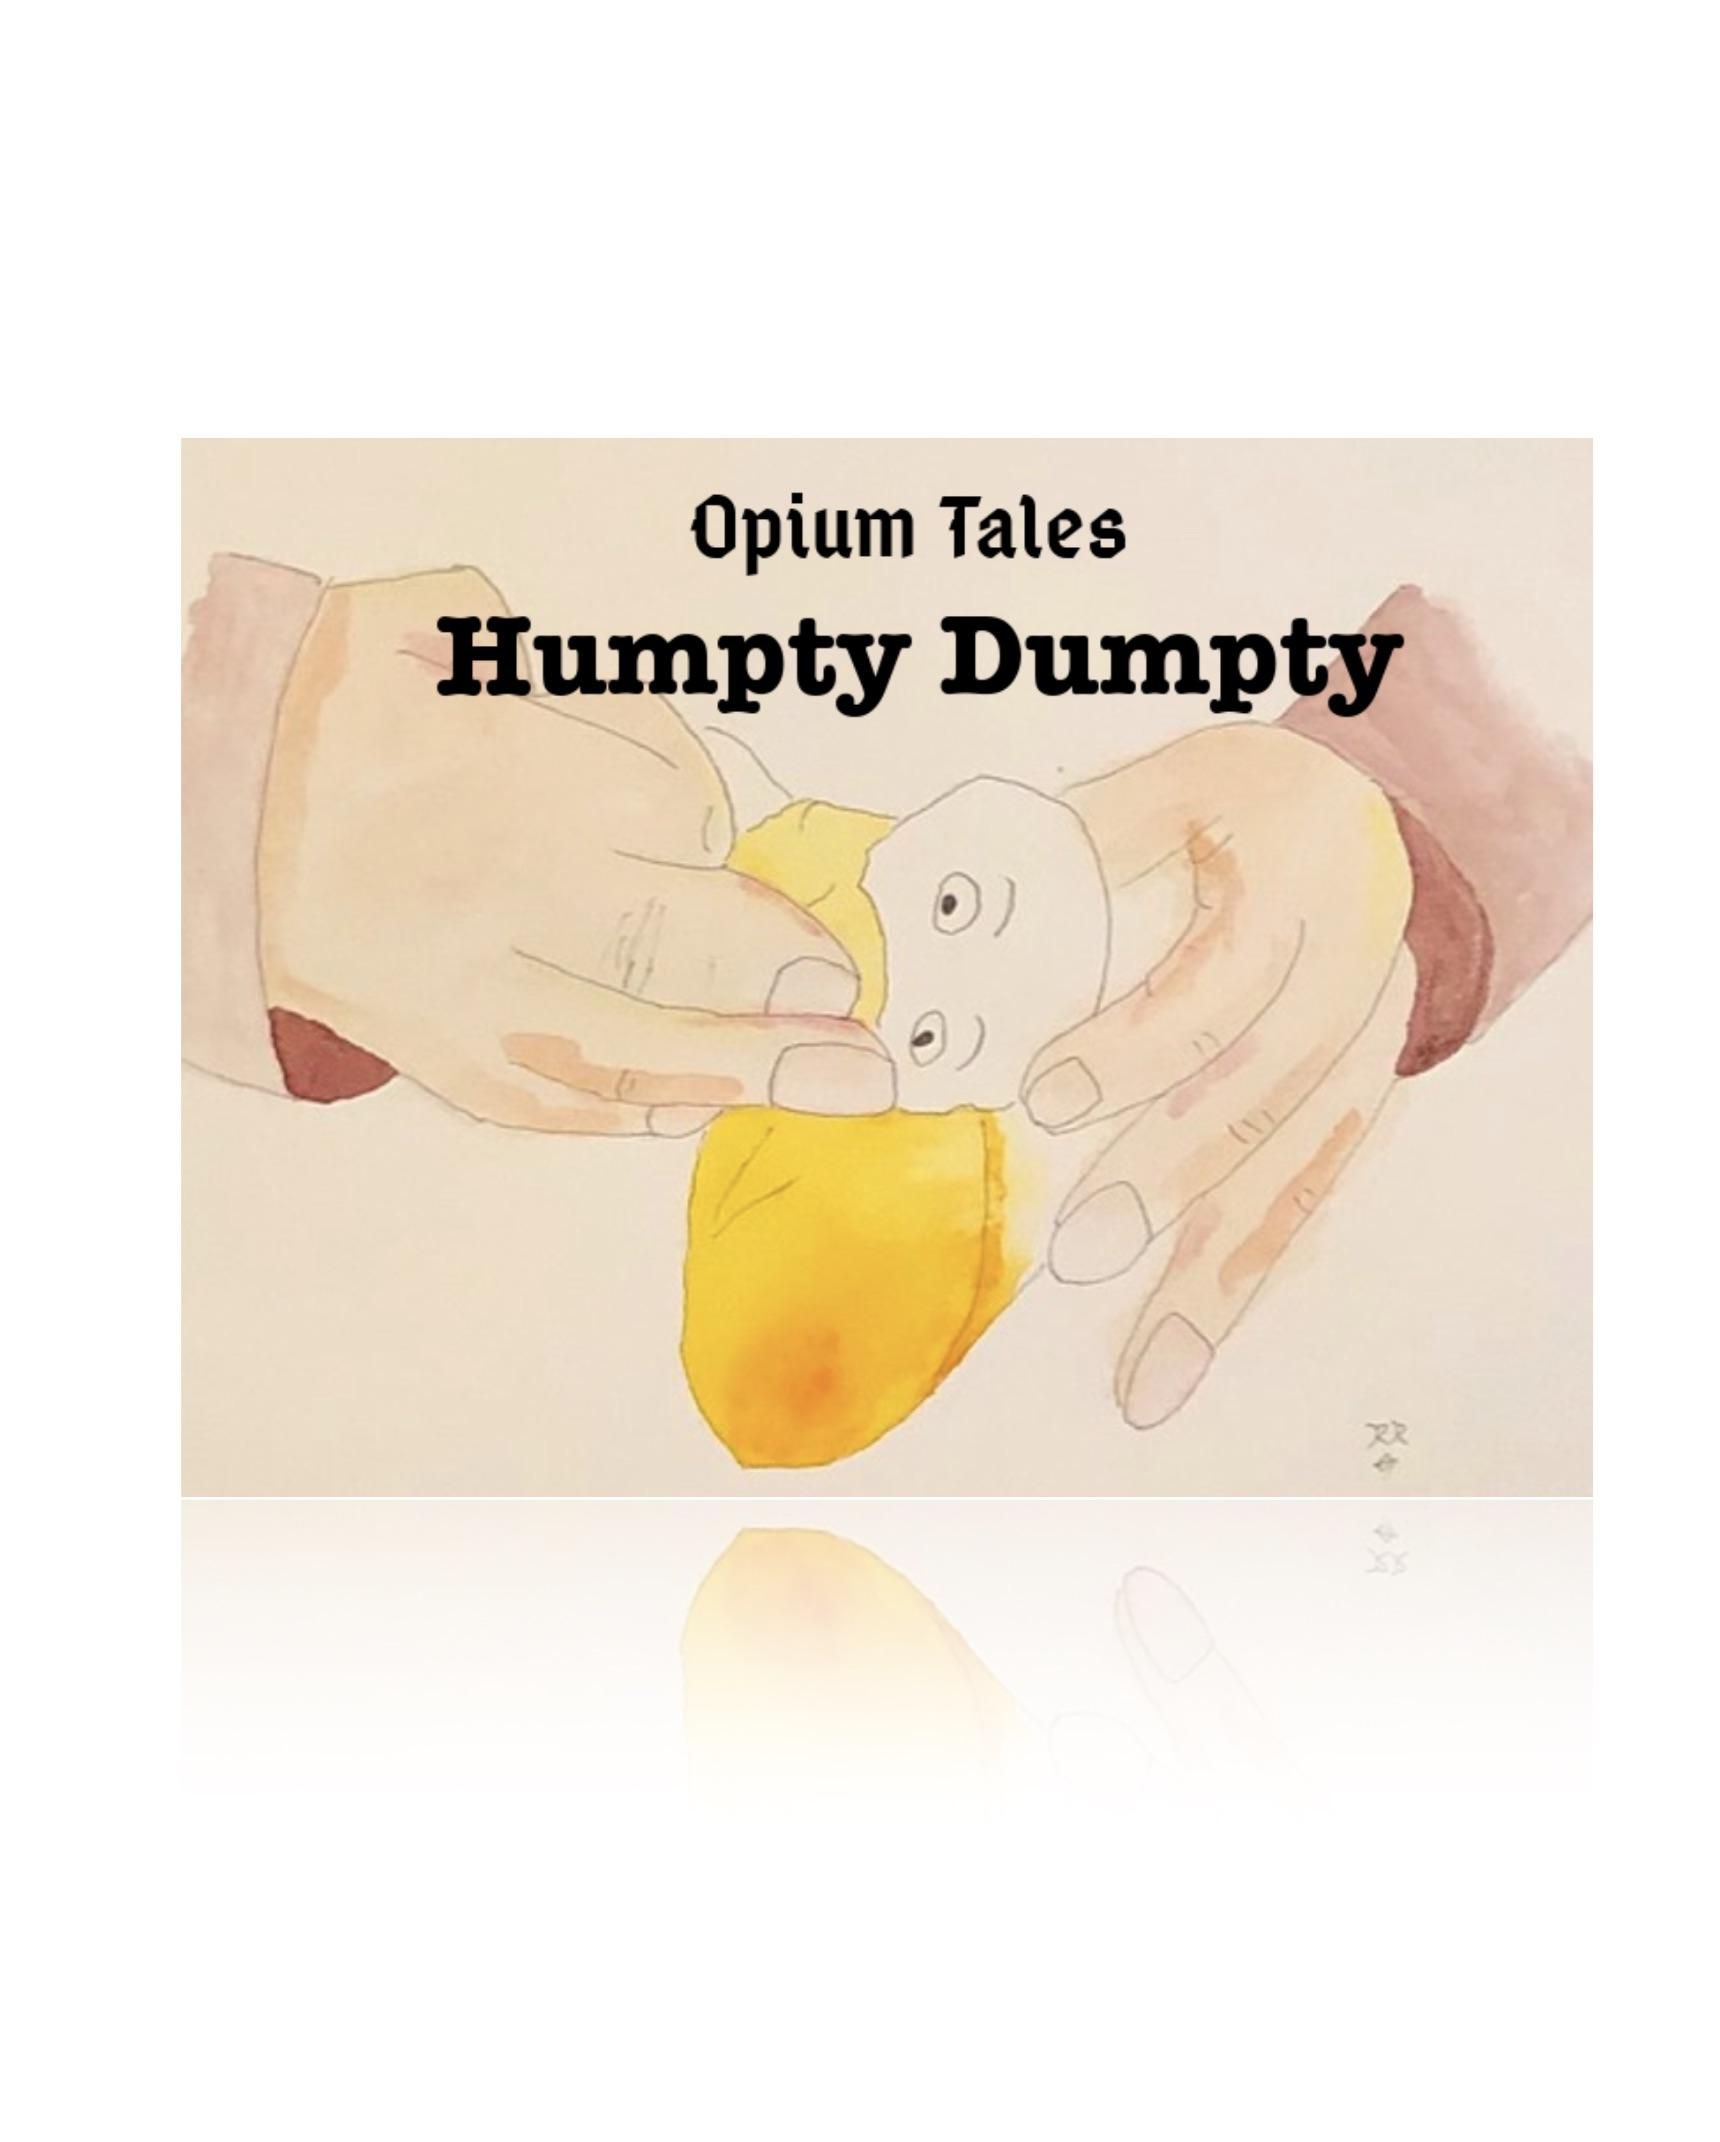 Humpty Dumpty short story